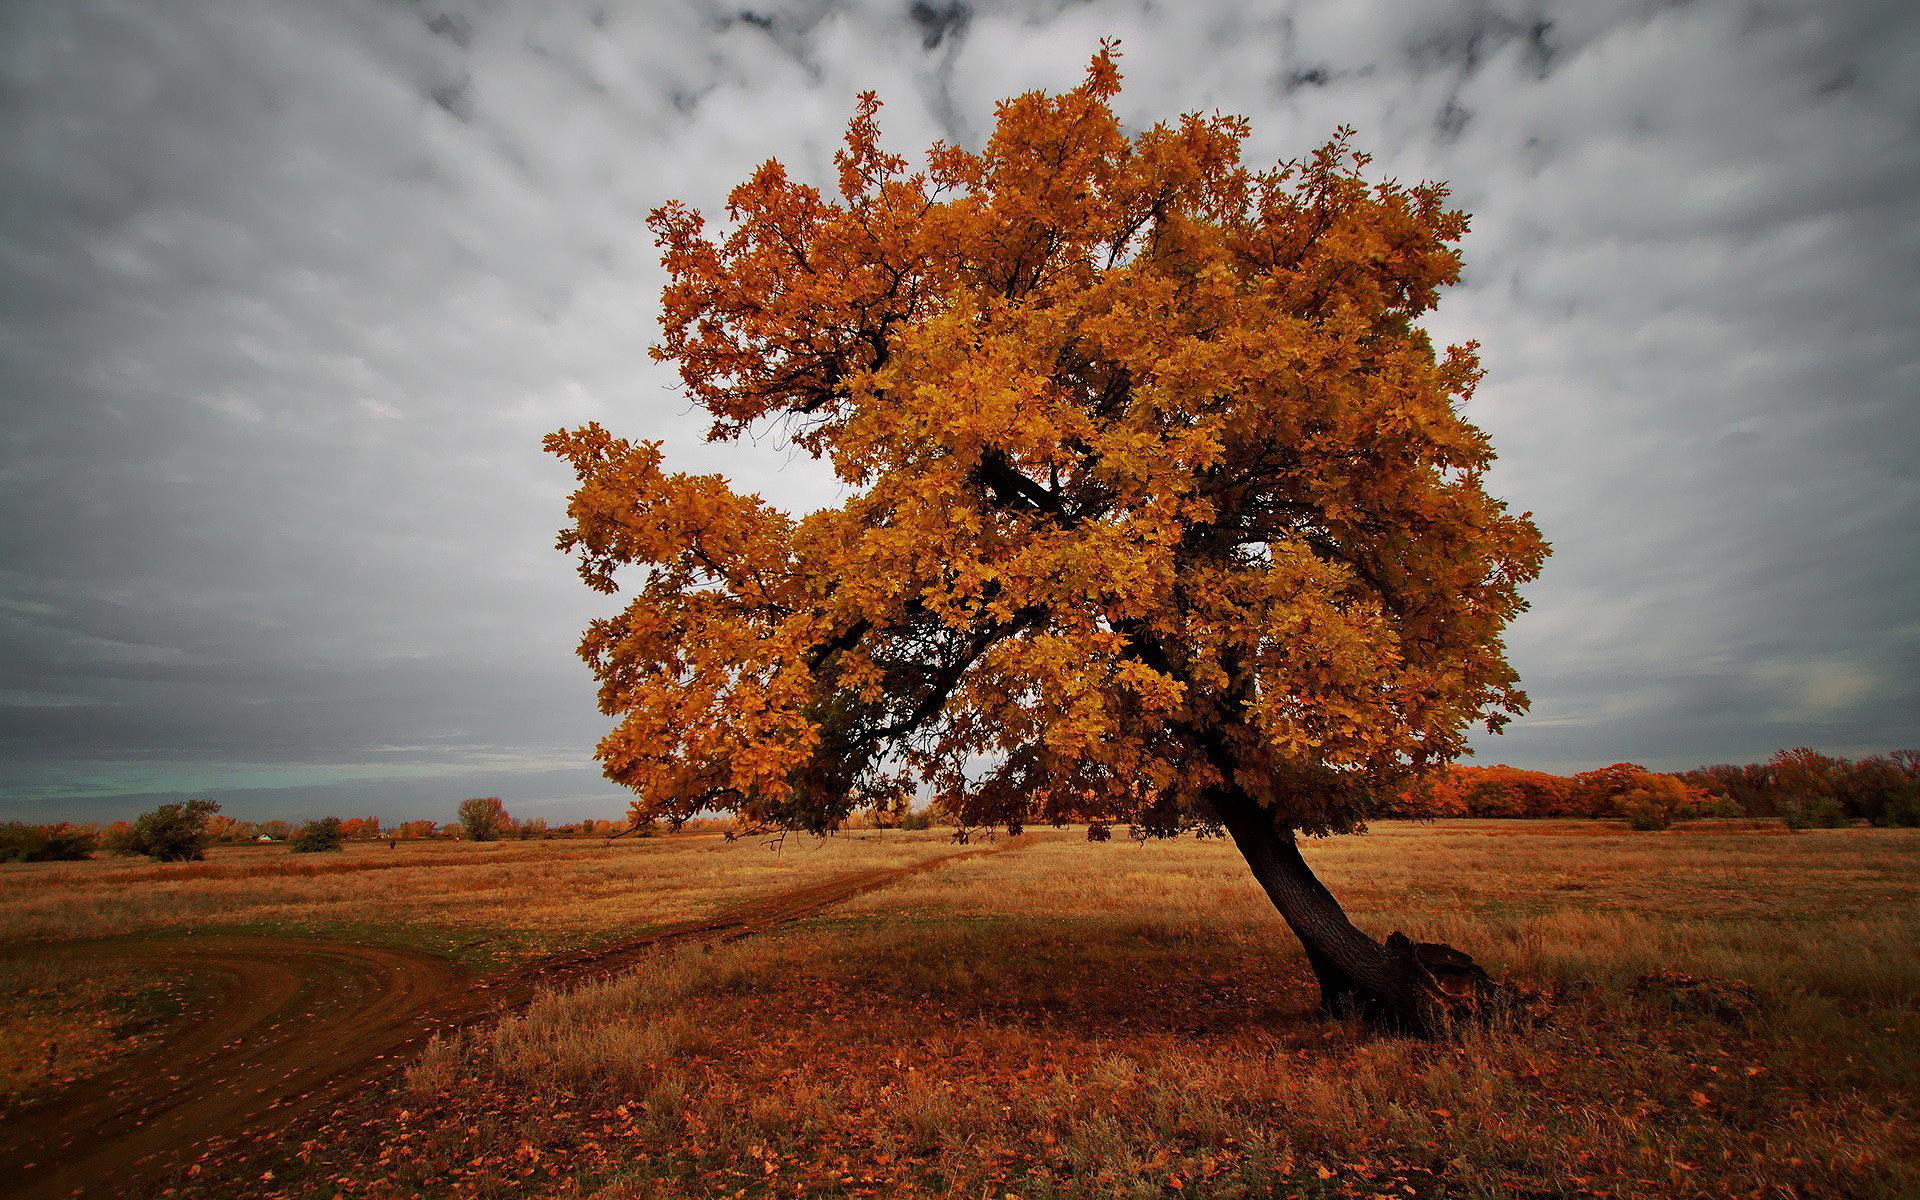 Live Photo Video Iphone X Wallpaper Autumn Brown Landscape Hd Desktop Wallpapers 4k Hd